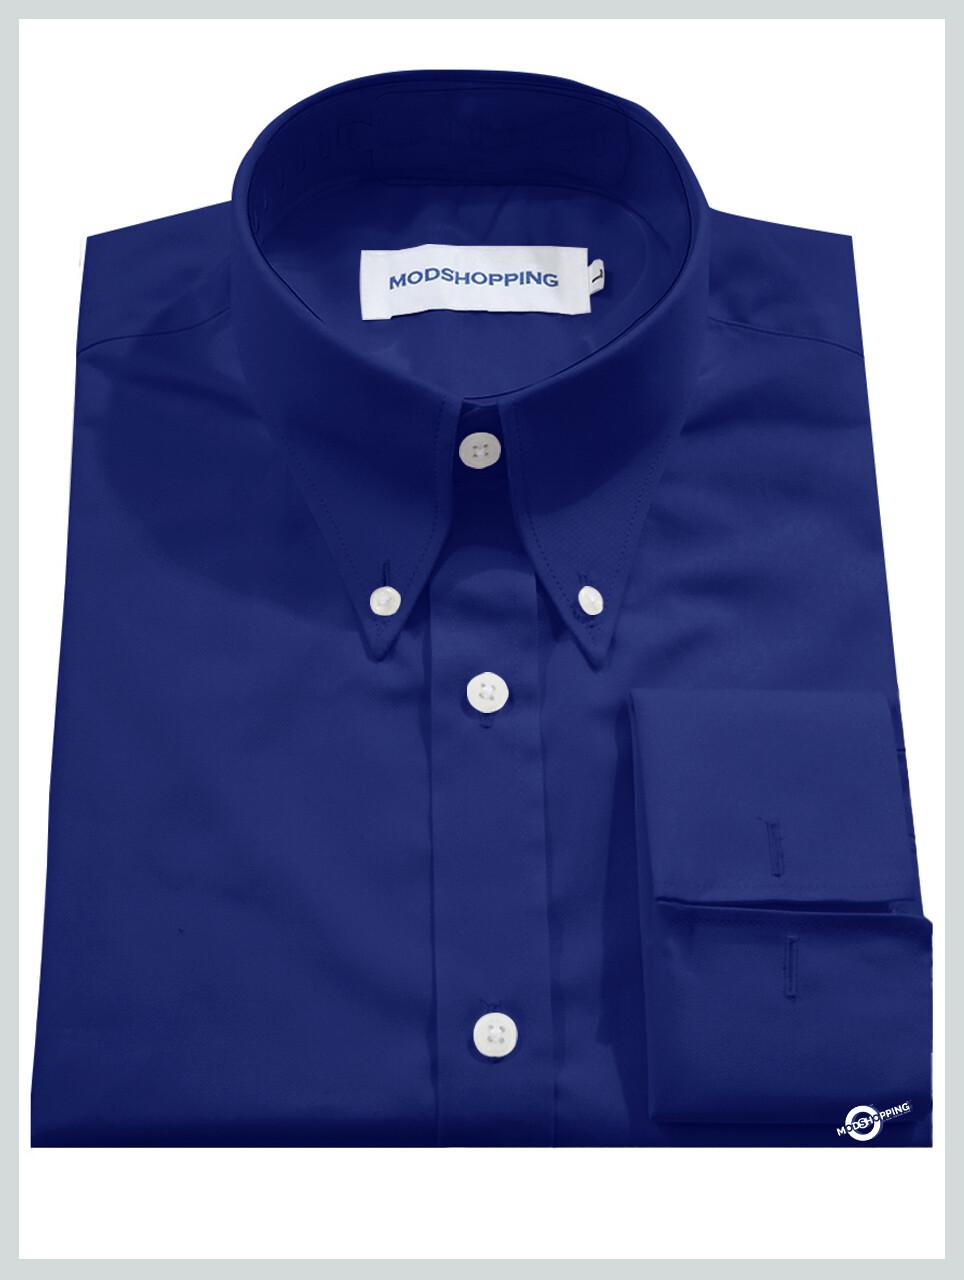 High Collar Blue Shirt| Formal Shirts For Men